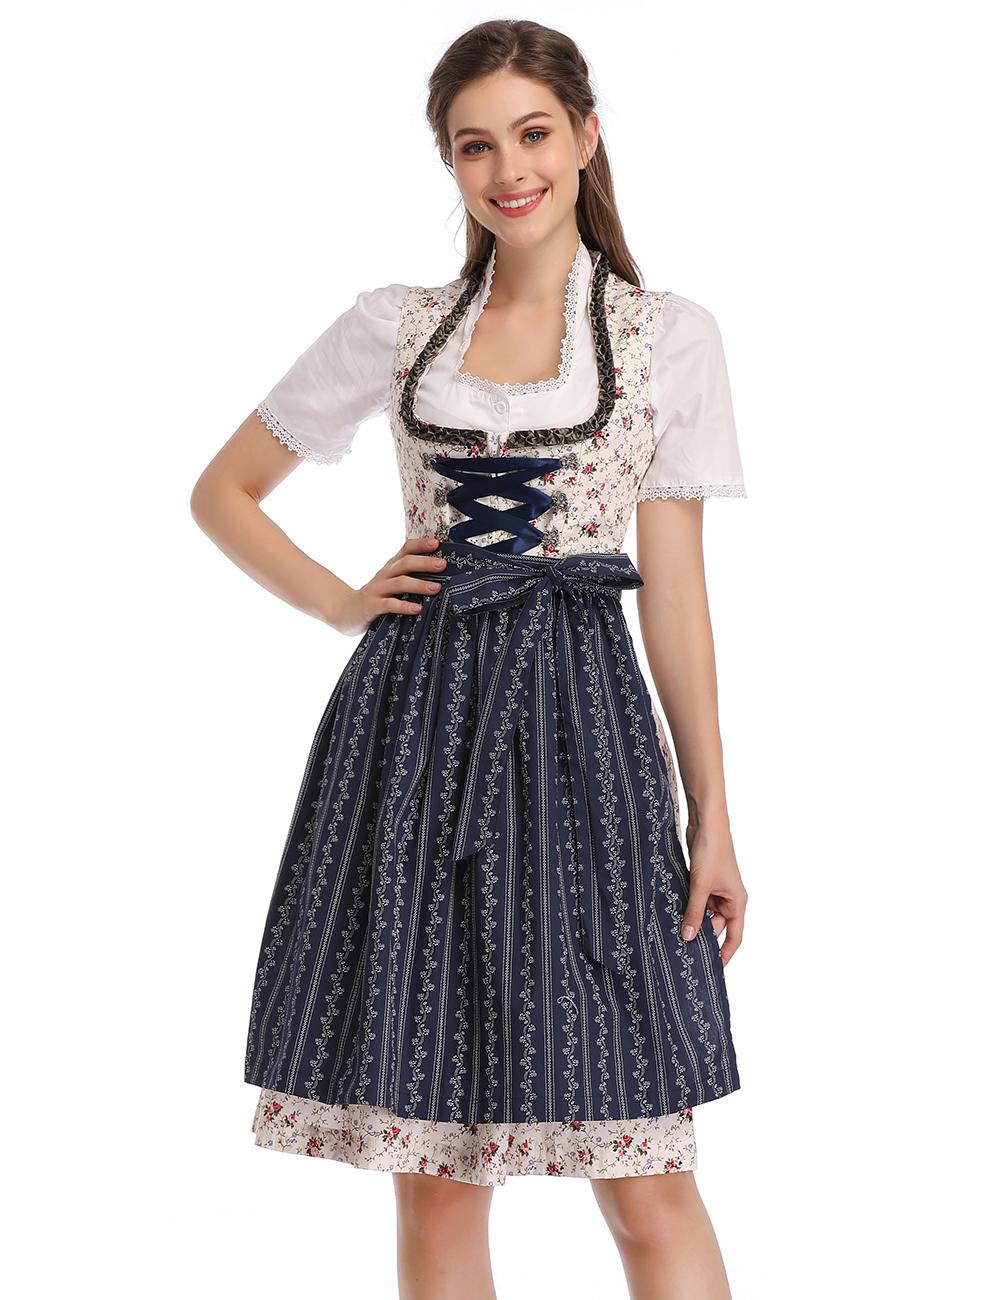 KOJOOIN Women's 3-Piece Vintage Stand Collar Floral German Oktoberfest Dirndl Dress